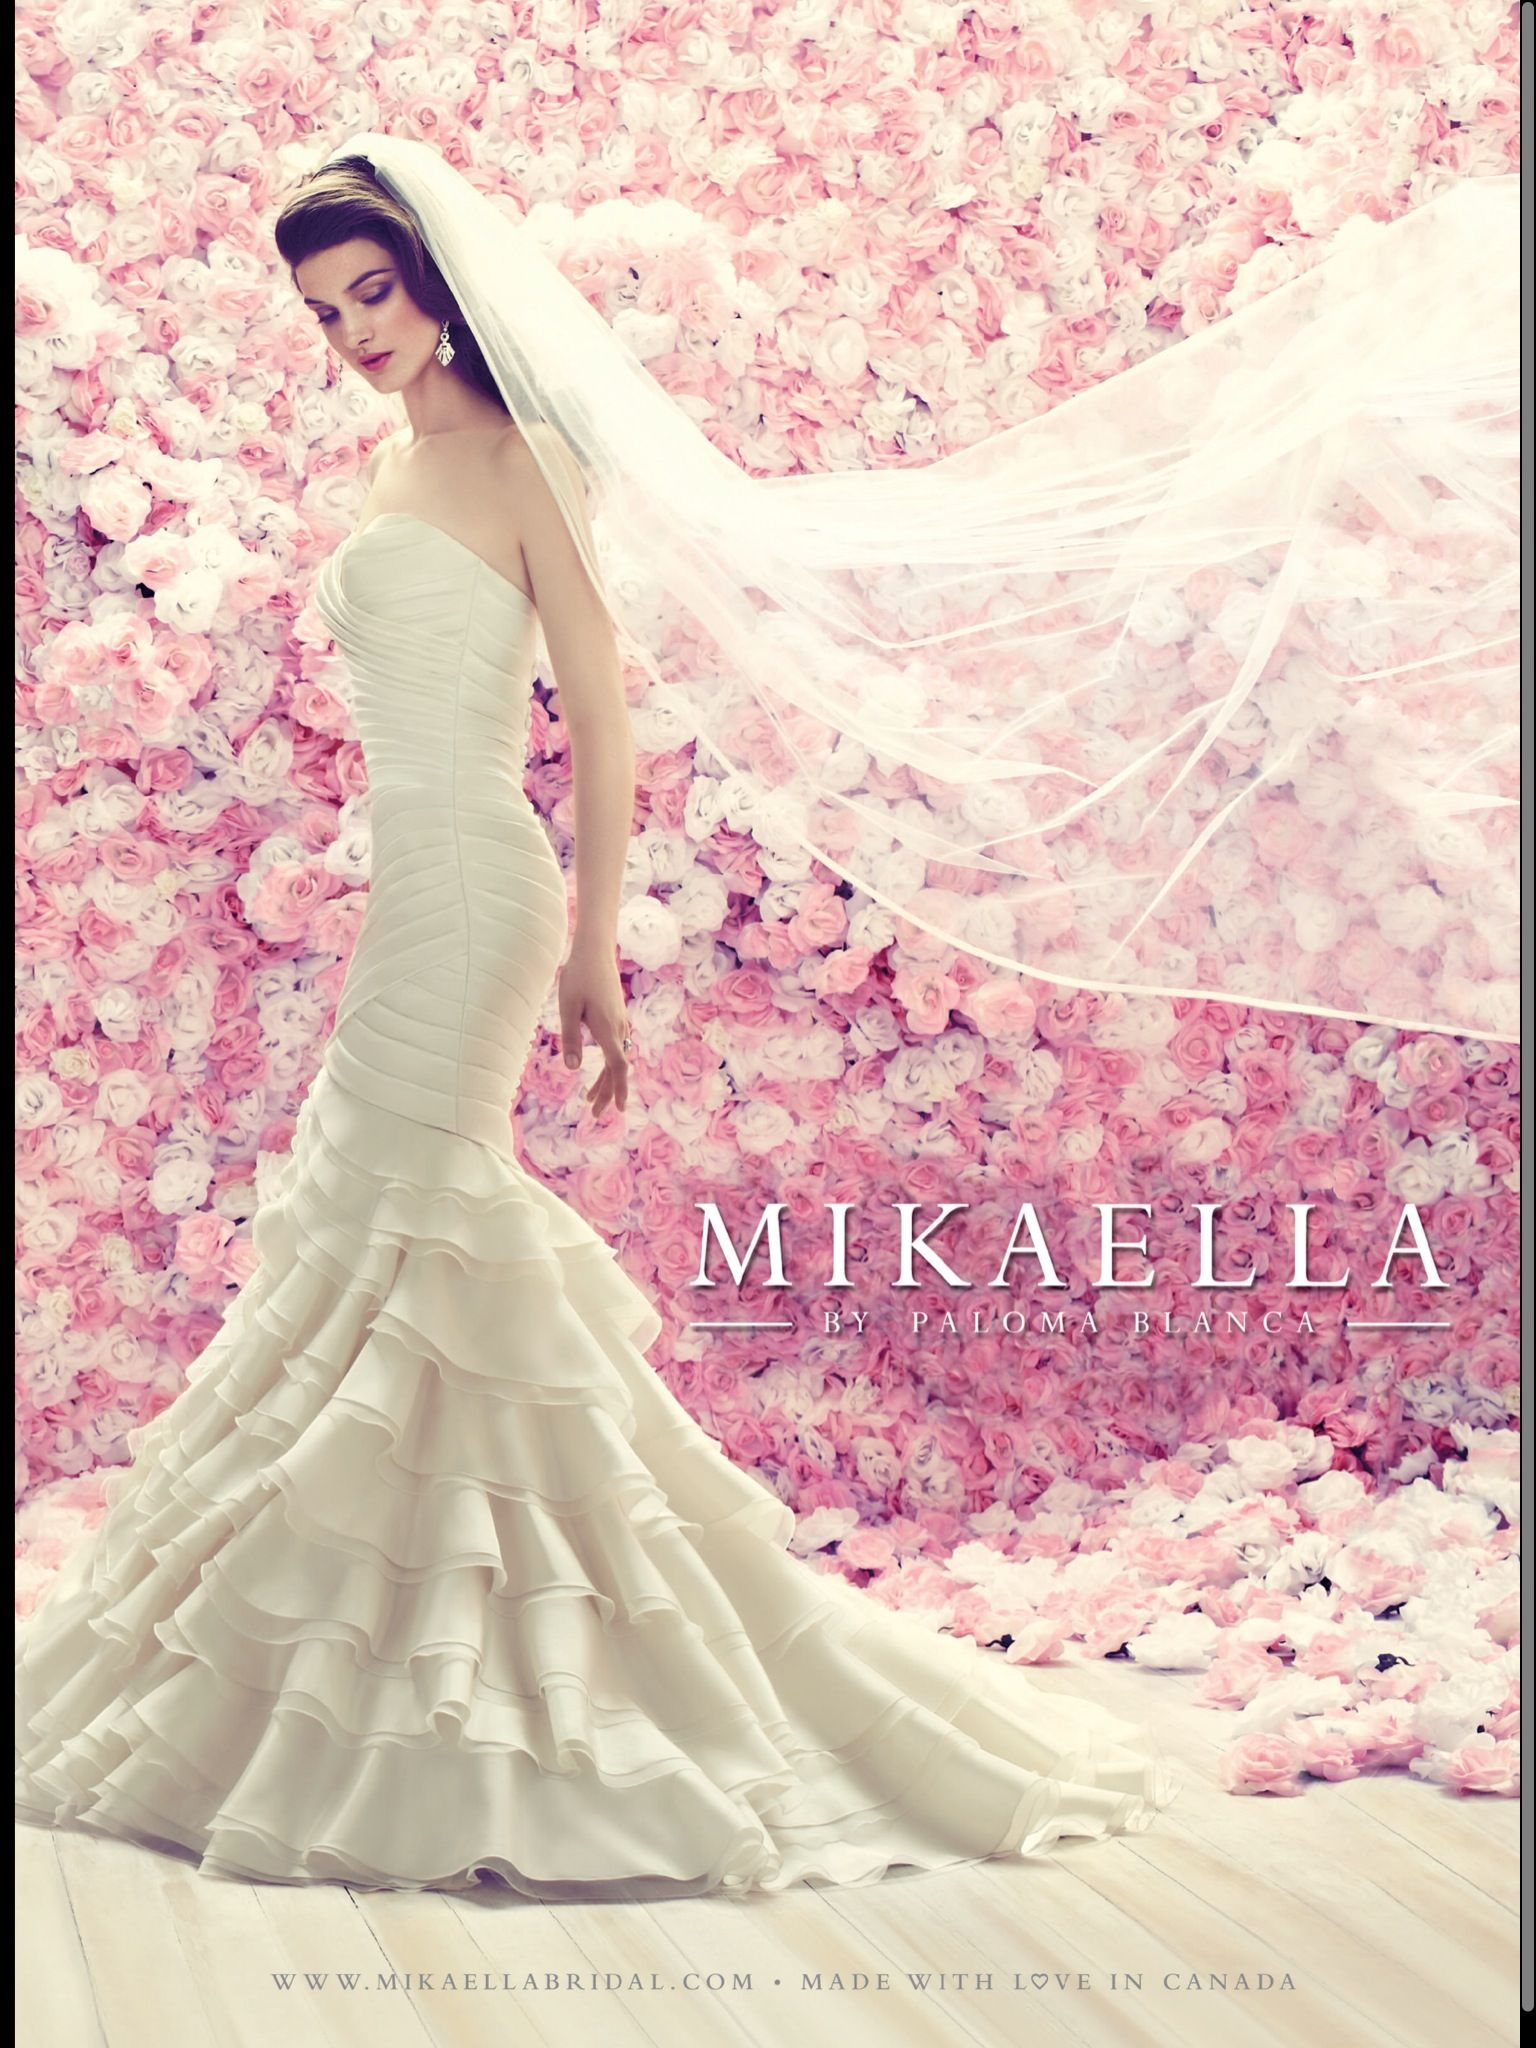 Mikaella by Paloma Blanca | Wedding dresses | Pinterest